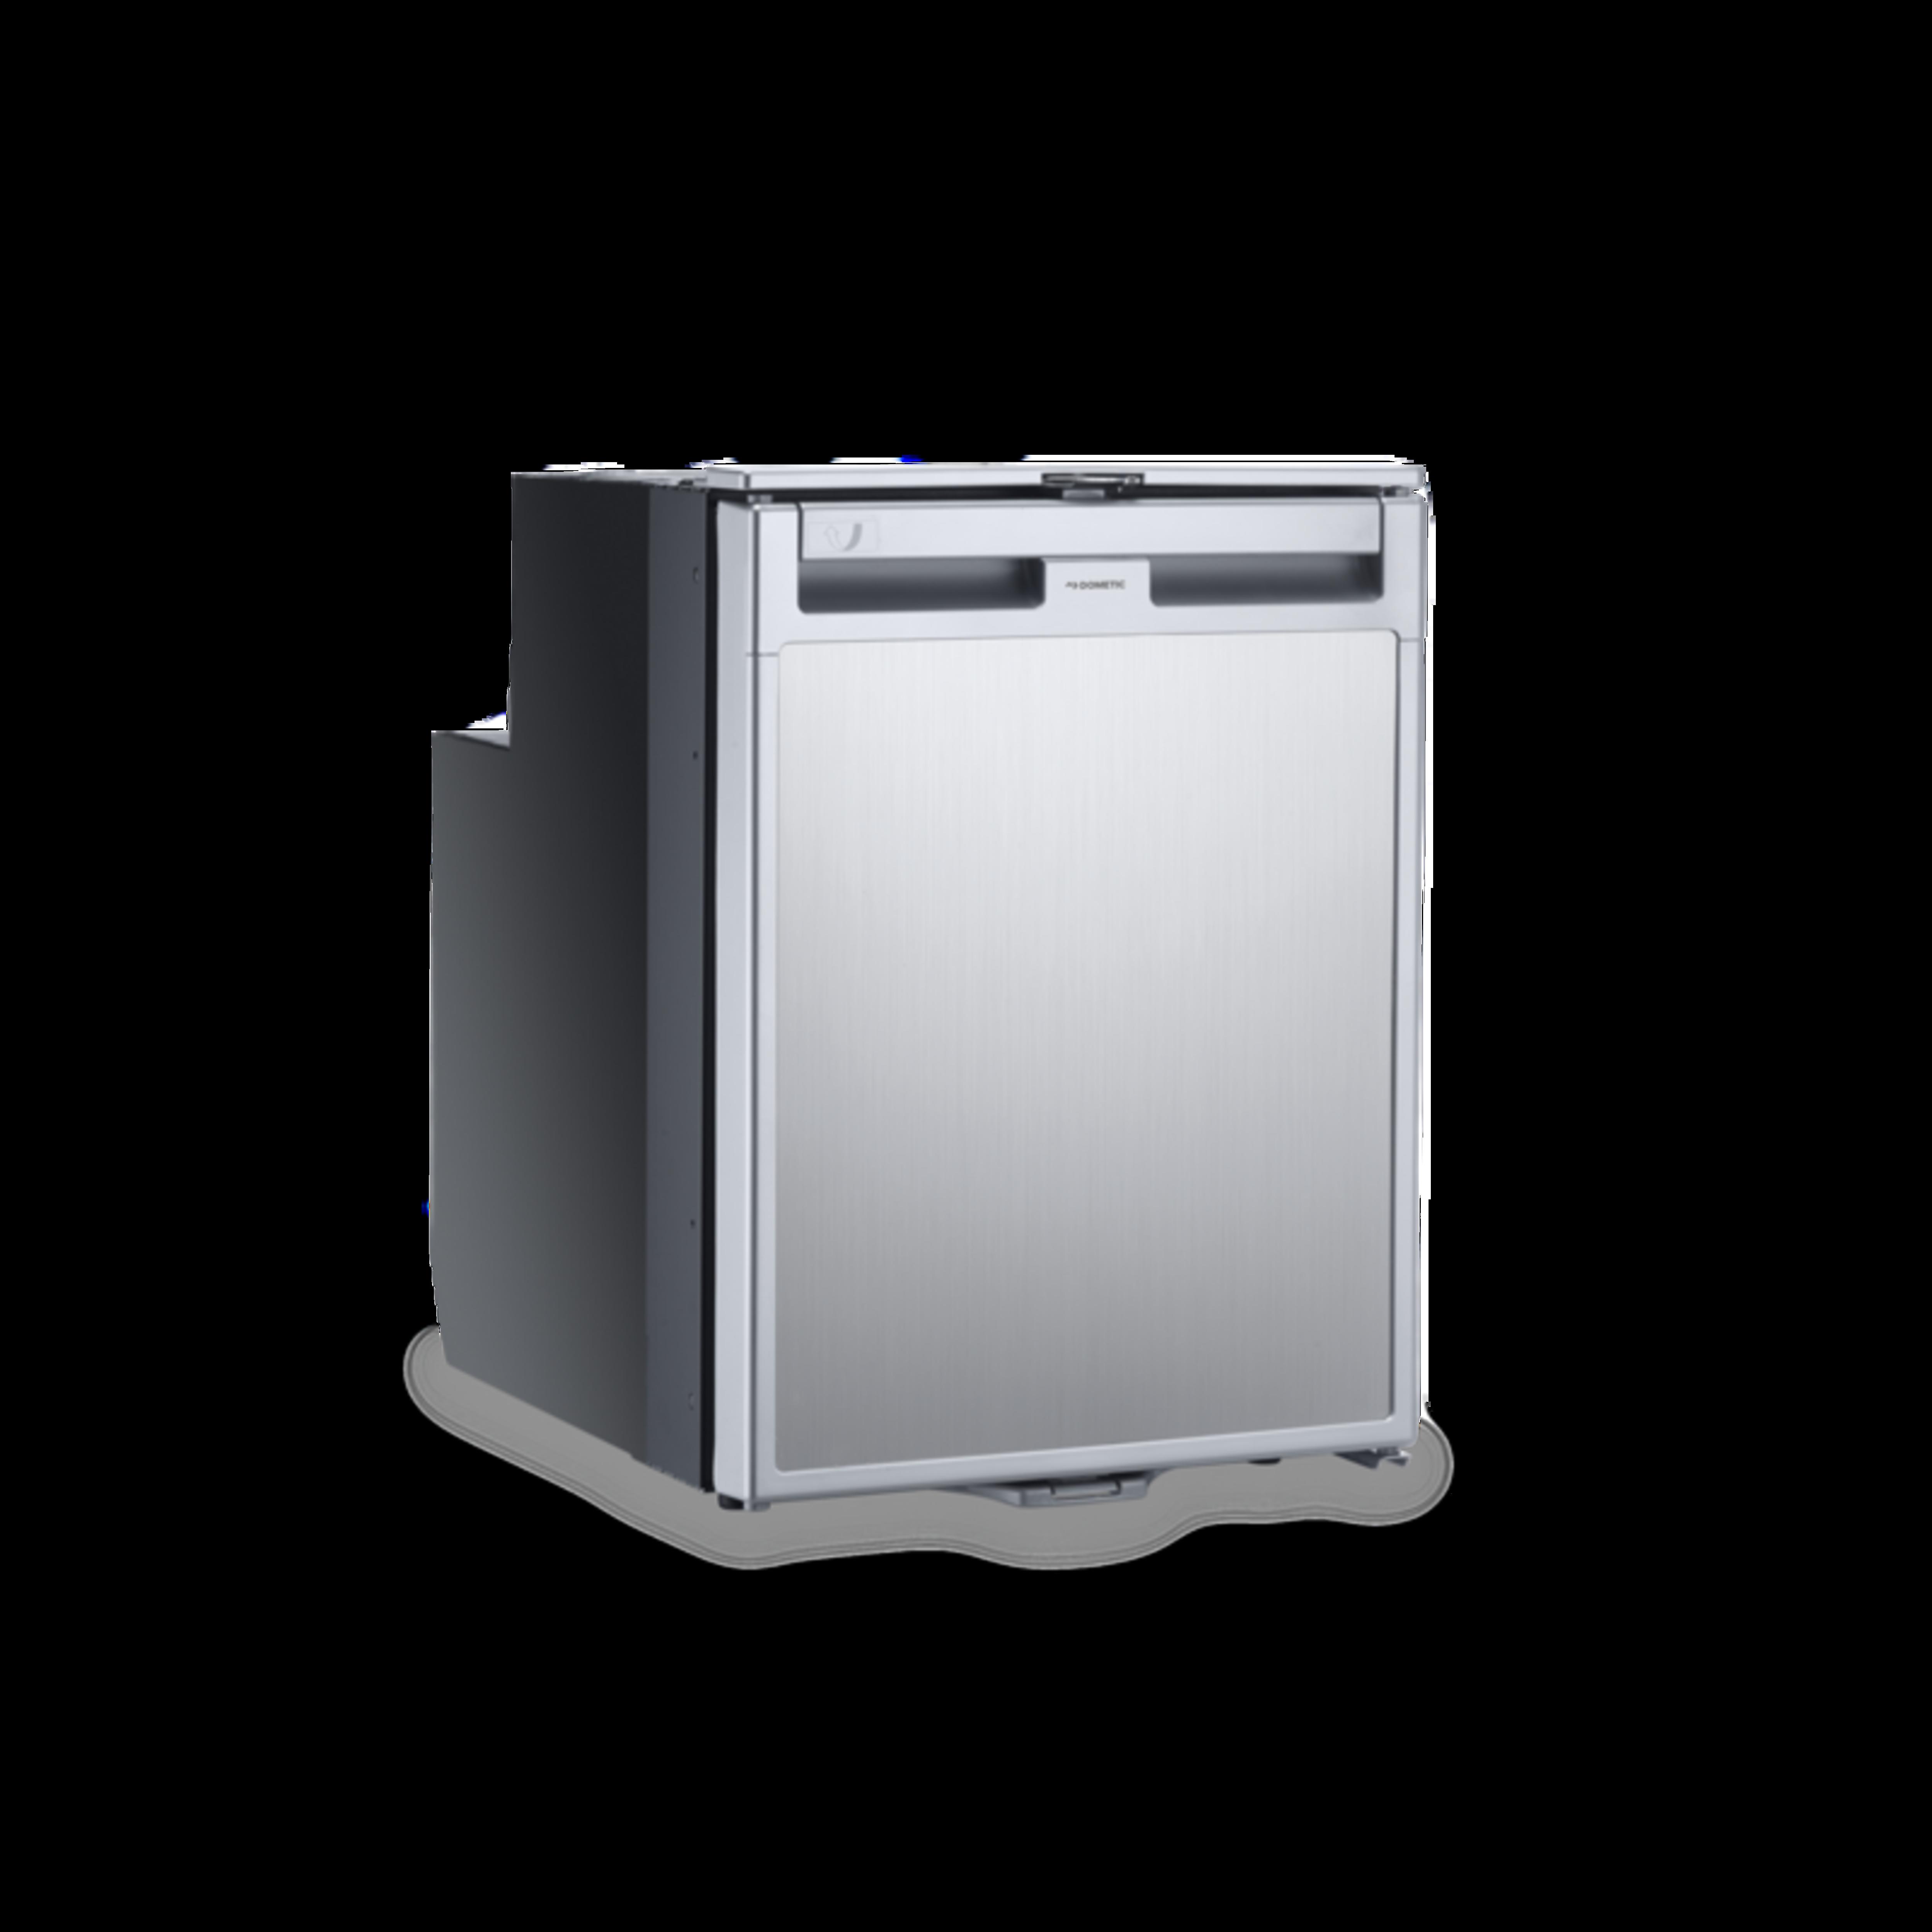 ᐅ Refrigerators and Cooling Units | Dometic